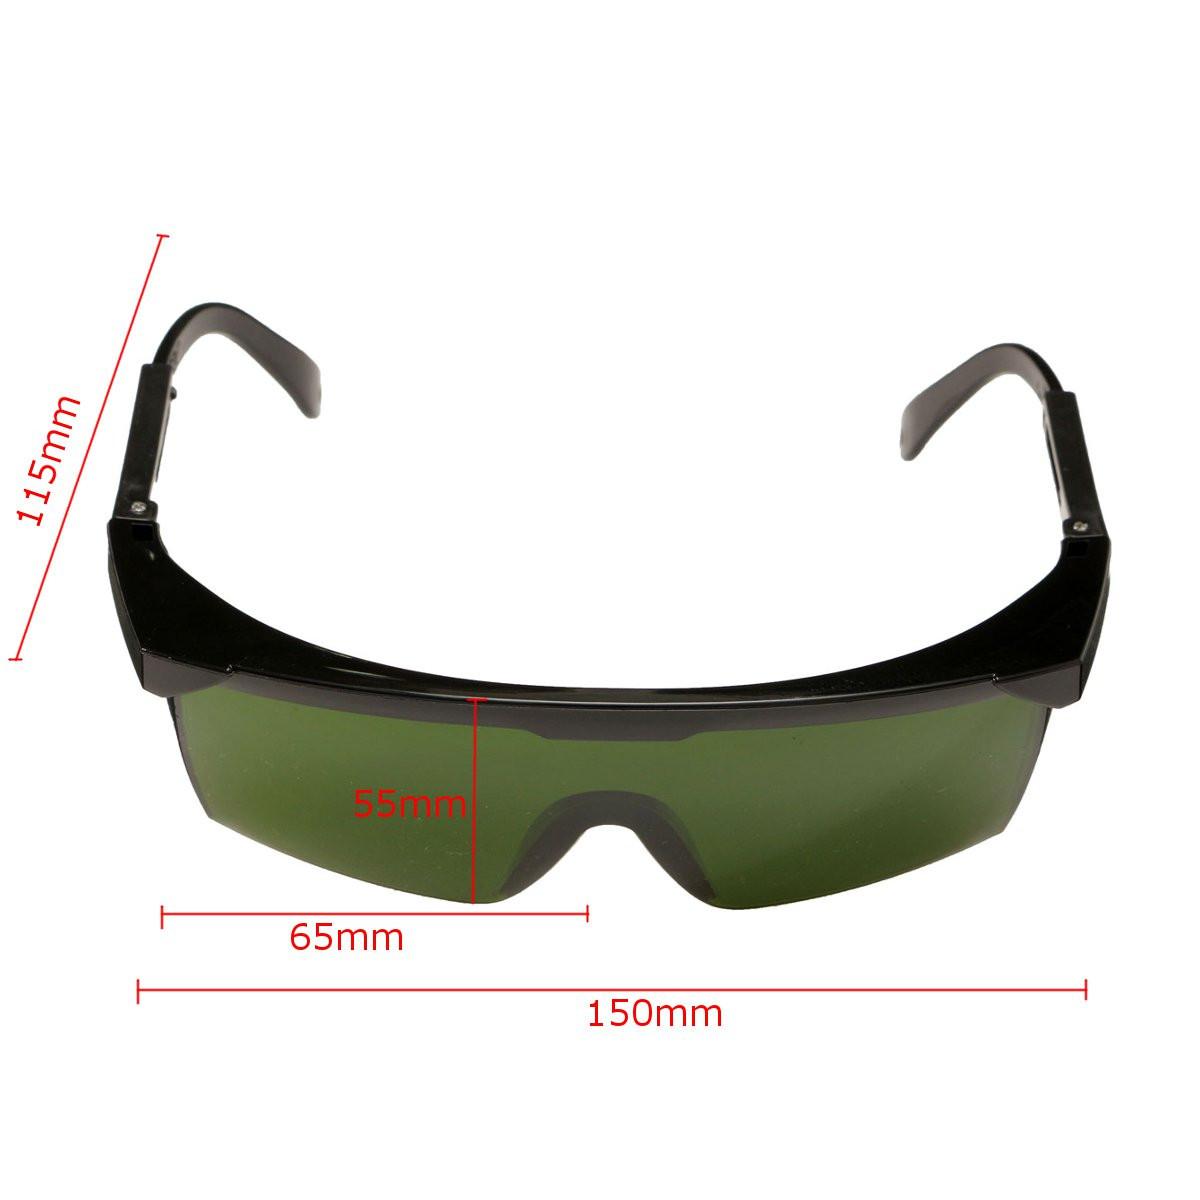 852ae48bc0a9ab Lunettes protection laser 200nm-2000nm de Glasses IPL-2 OD+4D